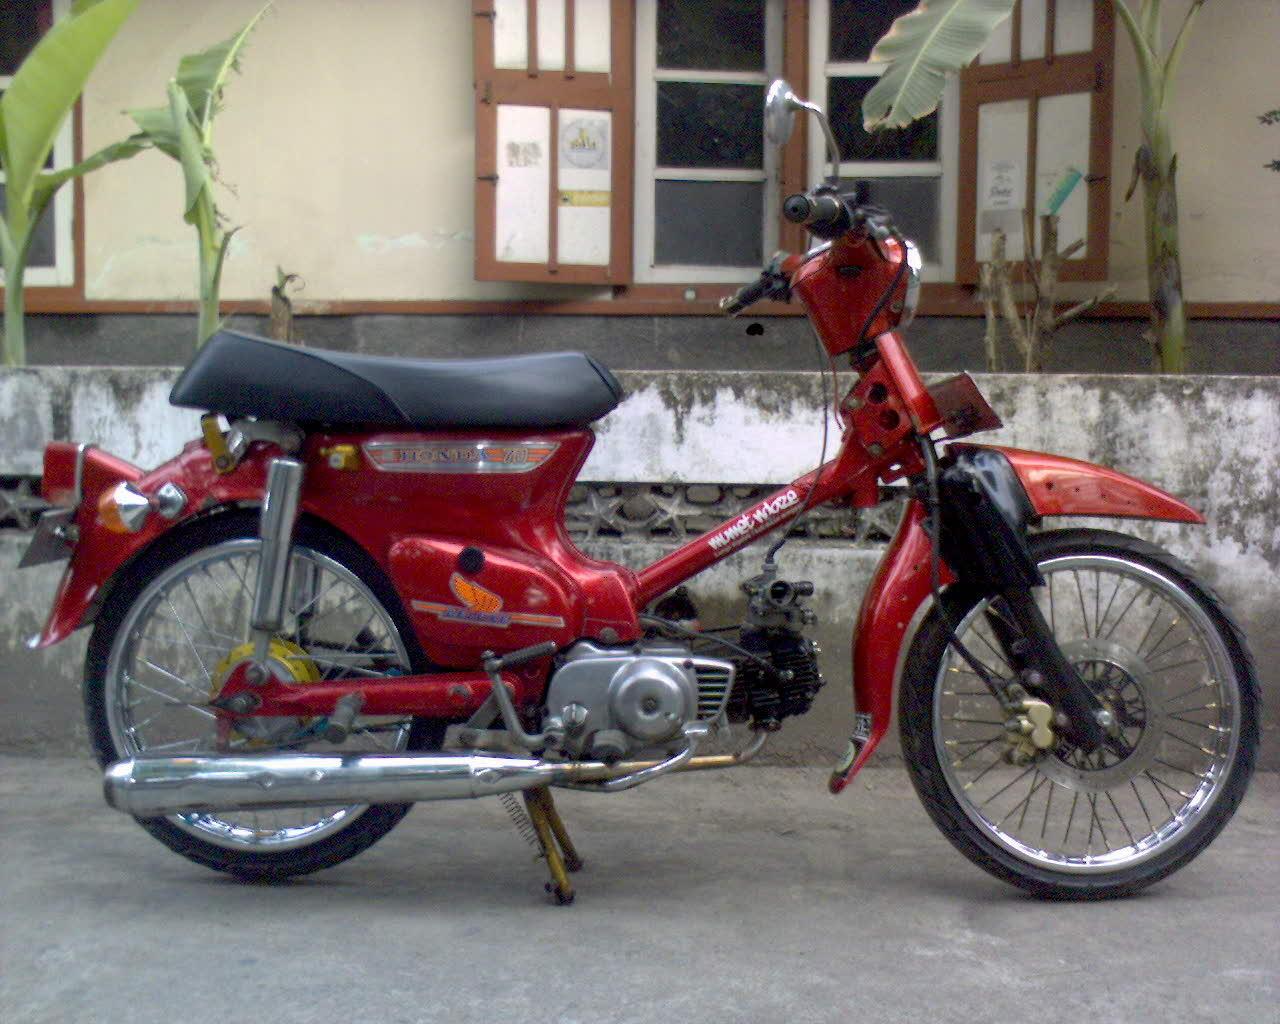 Cari Honda C70 Pitung Modif 4 Speed Plat AB Pajak Hidup Tahun 1980